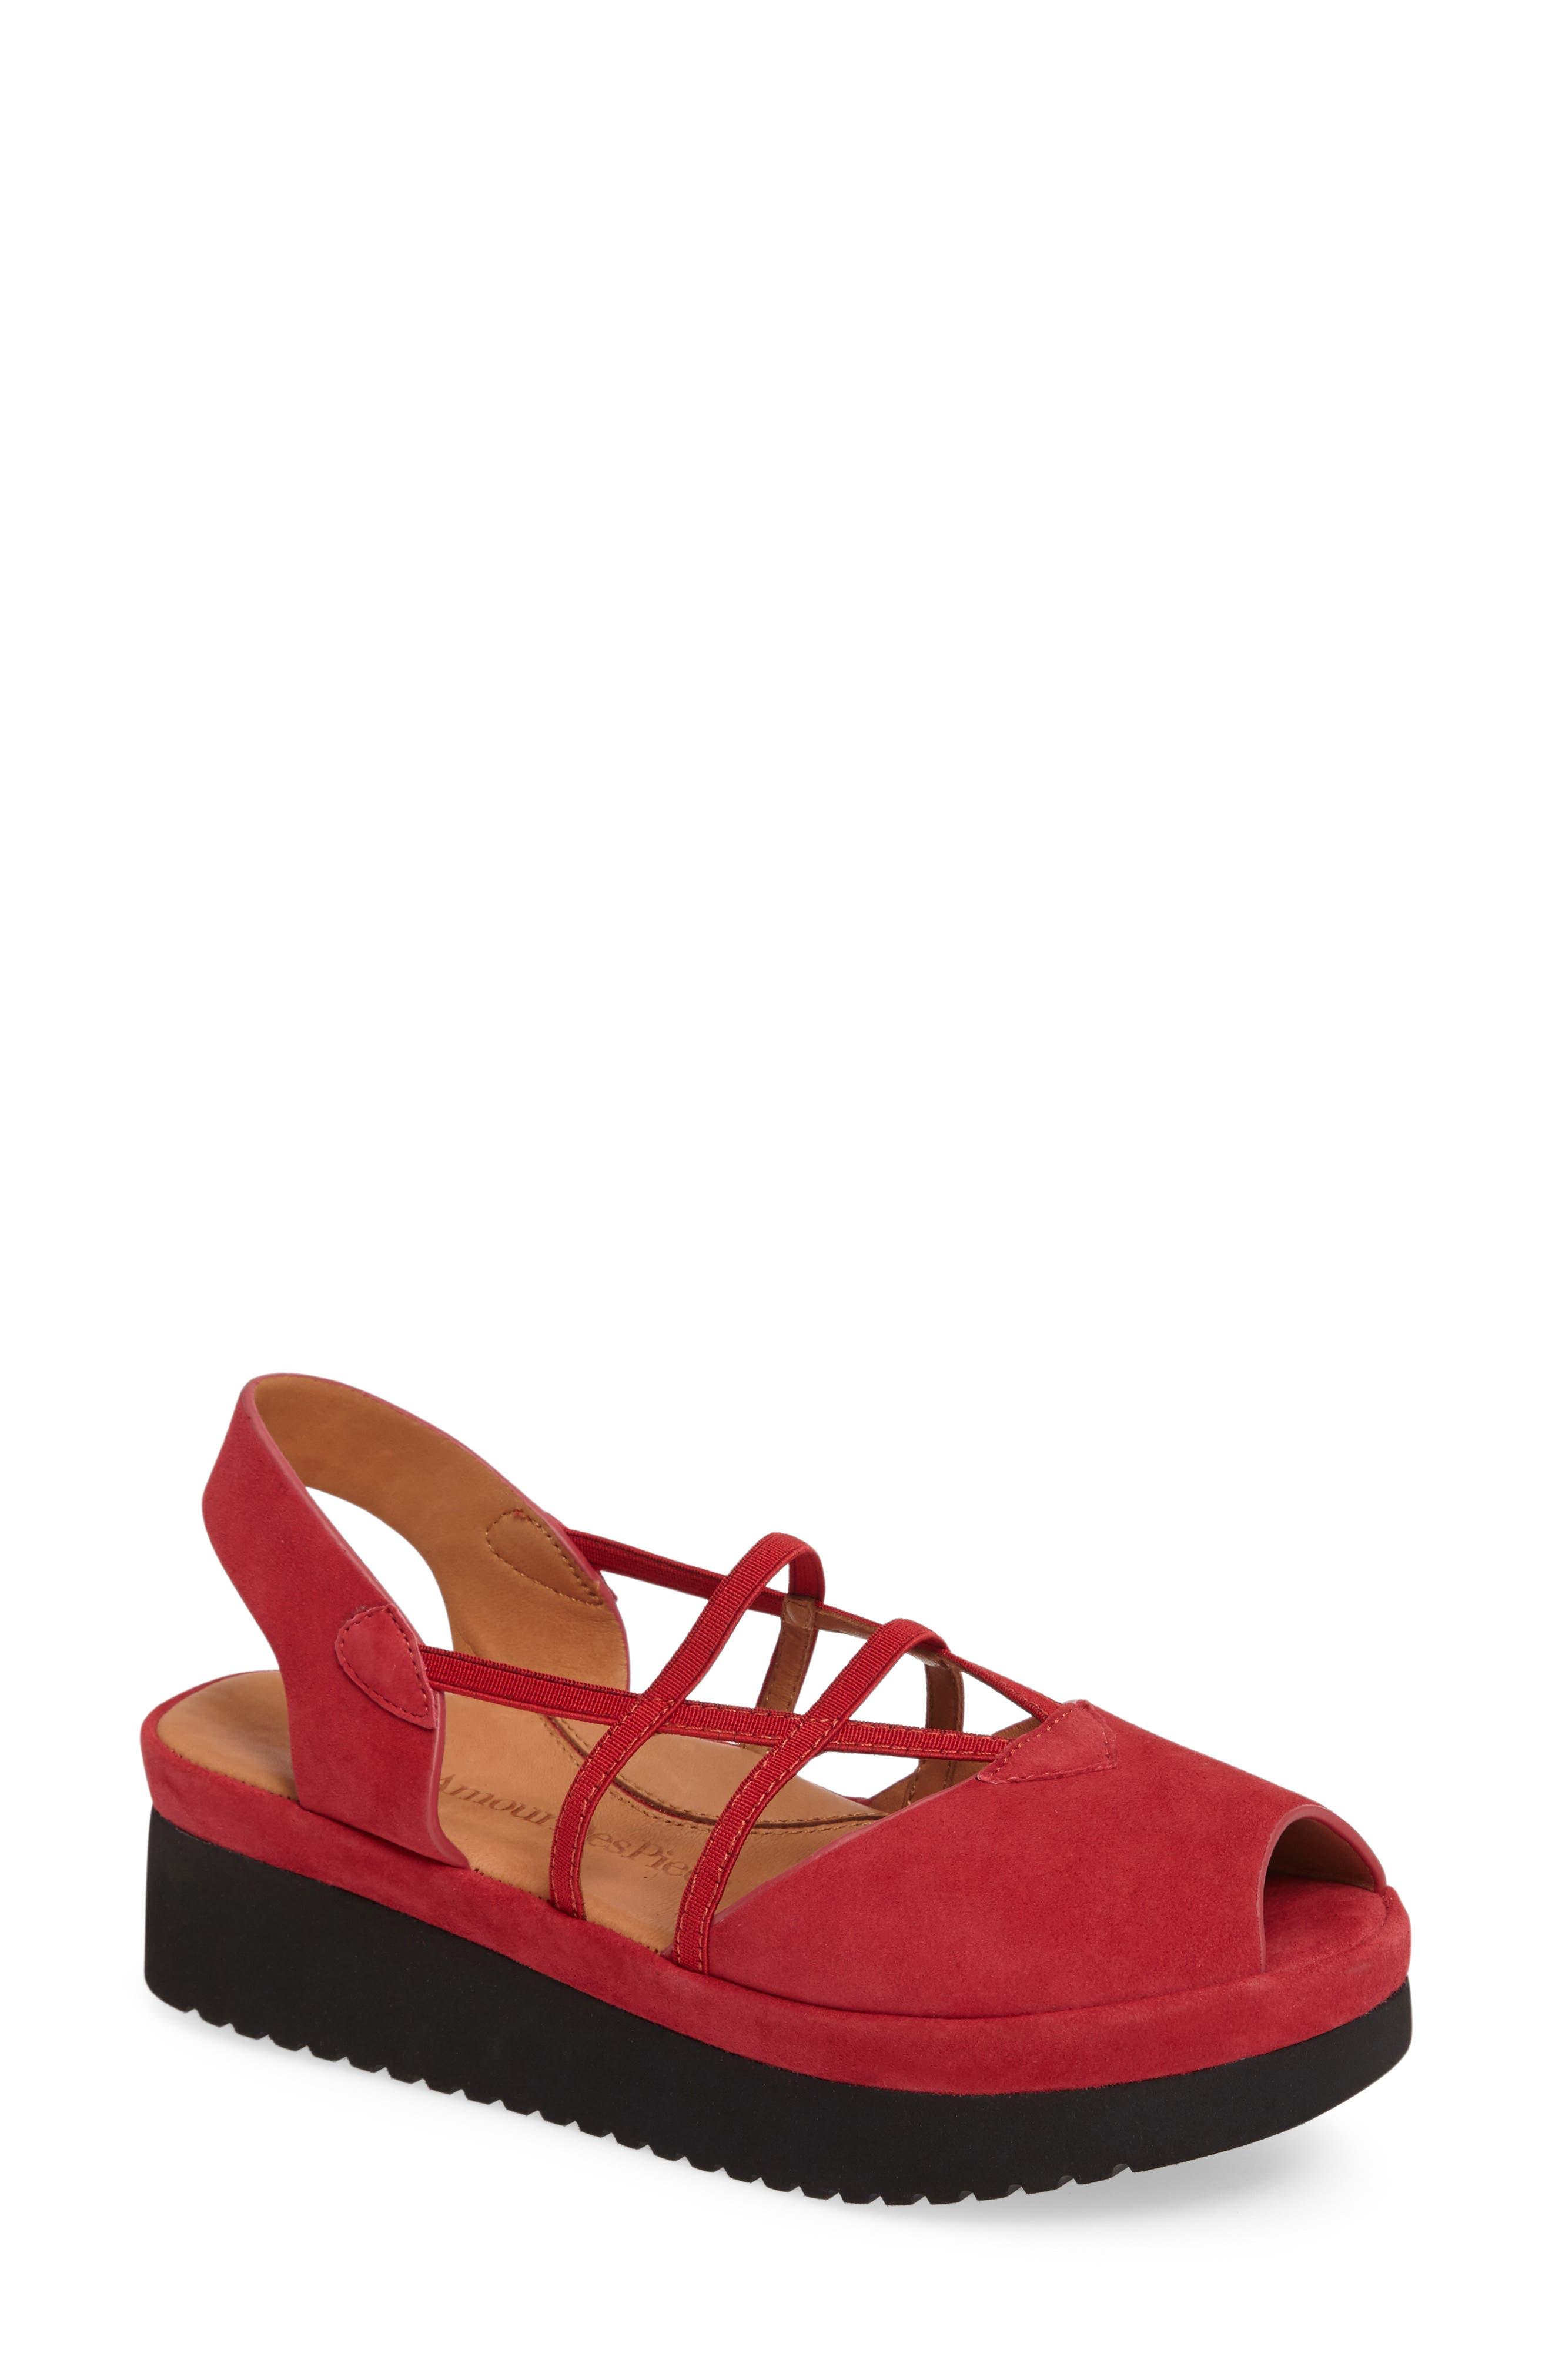 Adelais Platform Wedge Sandal,                             Main thumbnail 1, color,                             Red Nubuck Leather